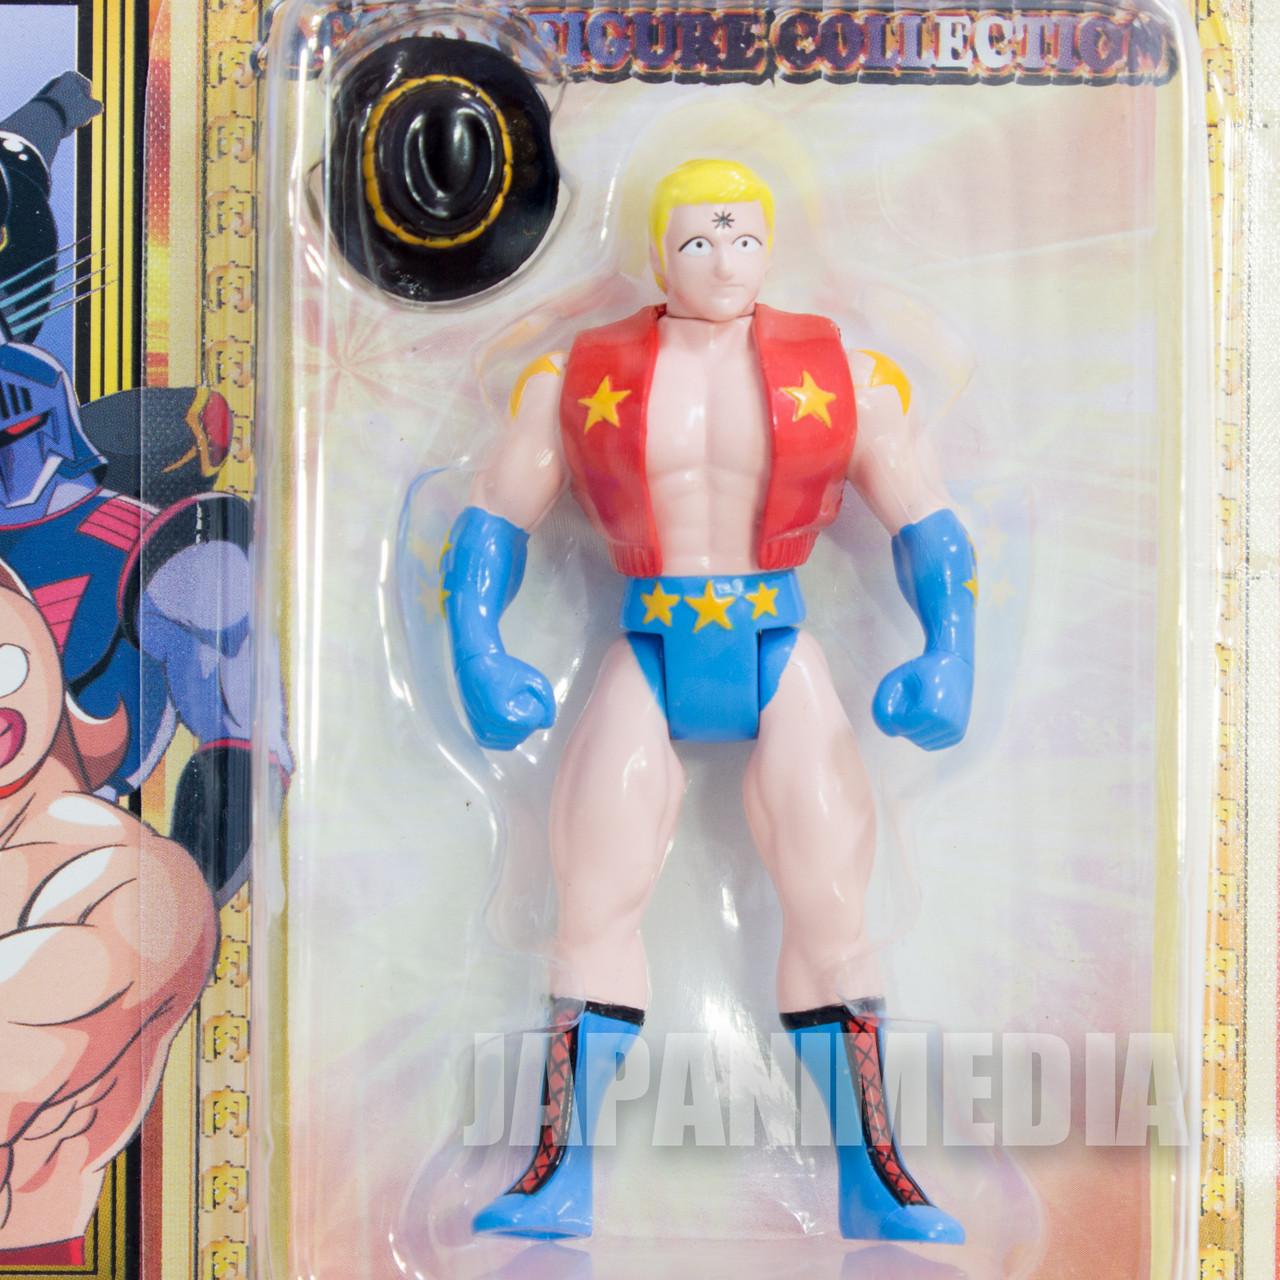 Muscleman anime figure JUMP 50TH 25 cm Kinnikuman Anime figurine taille